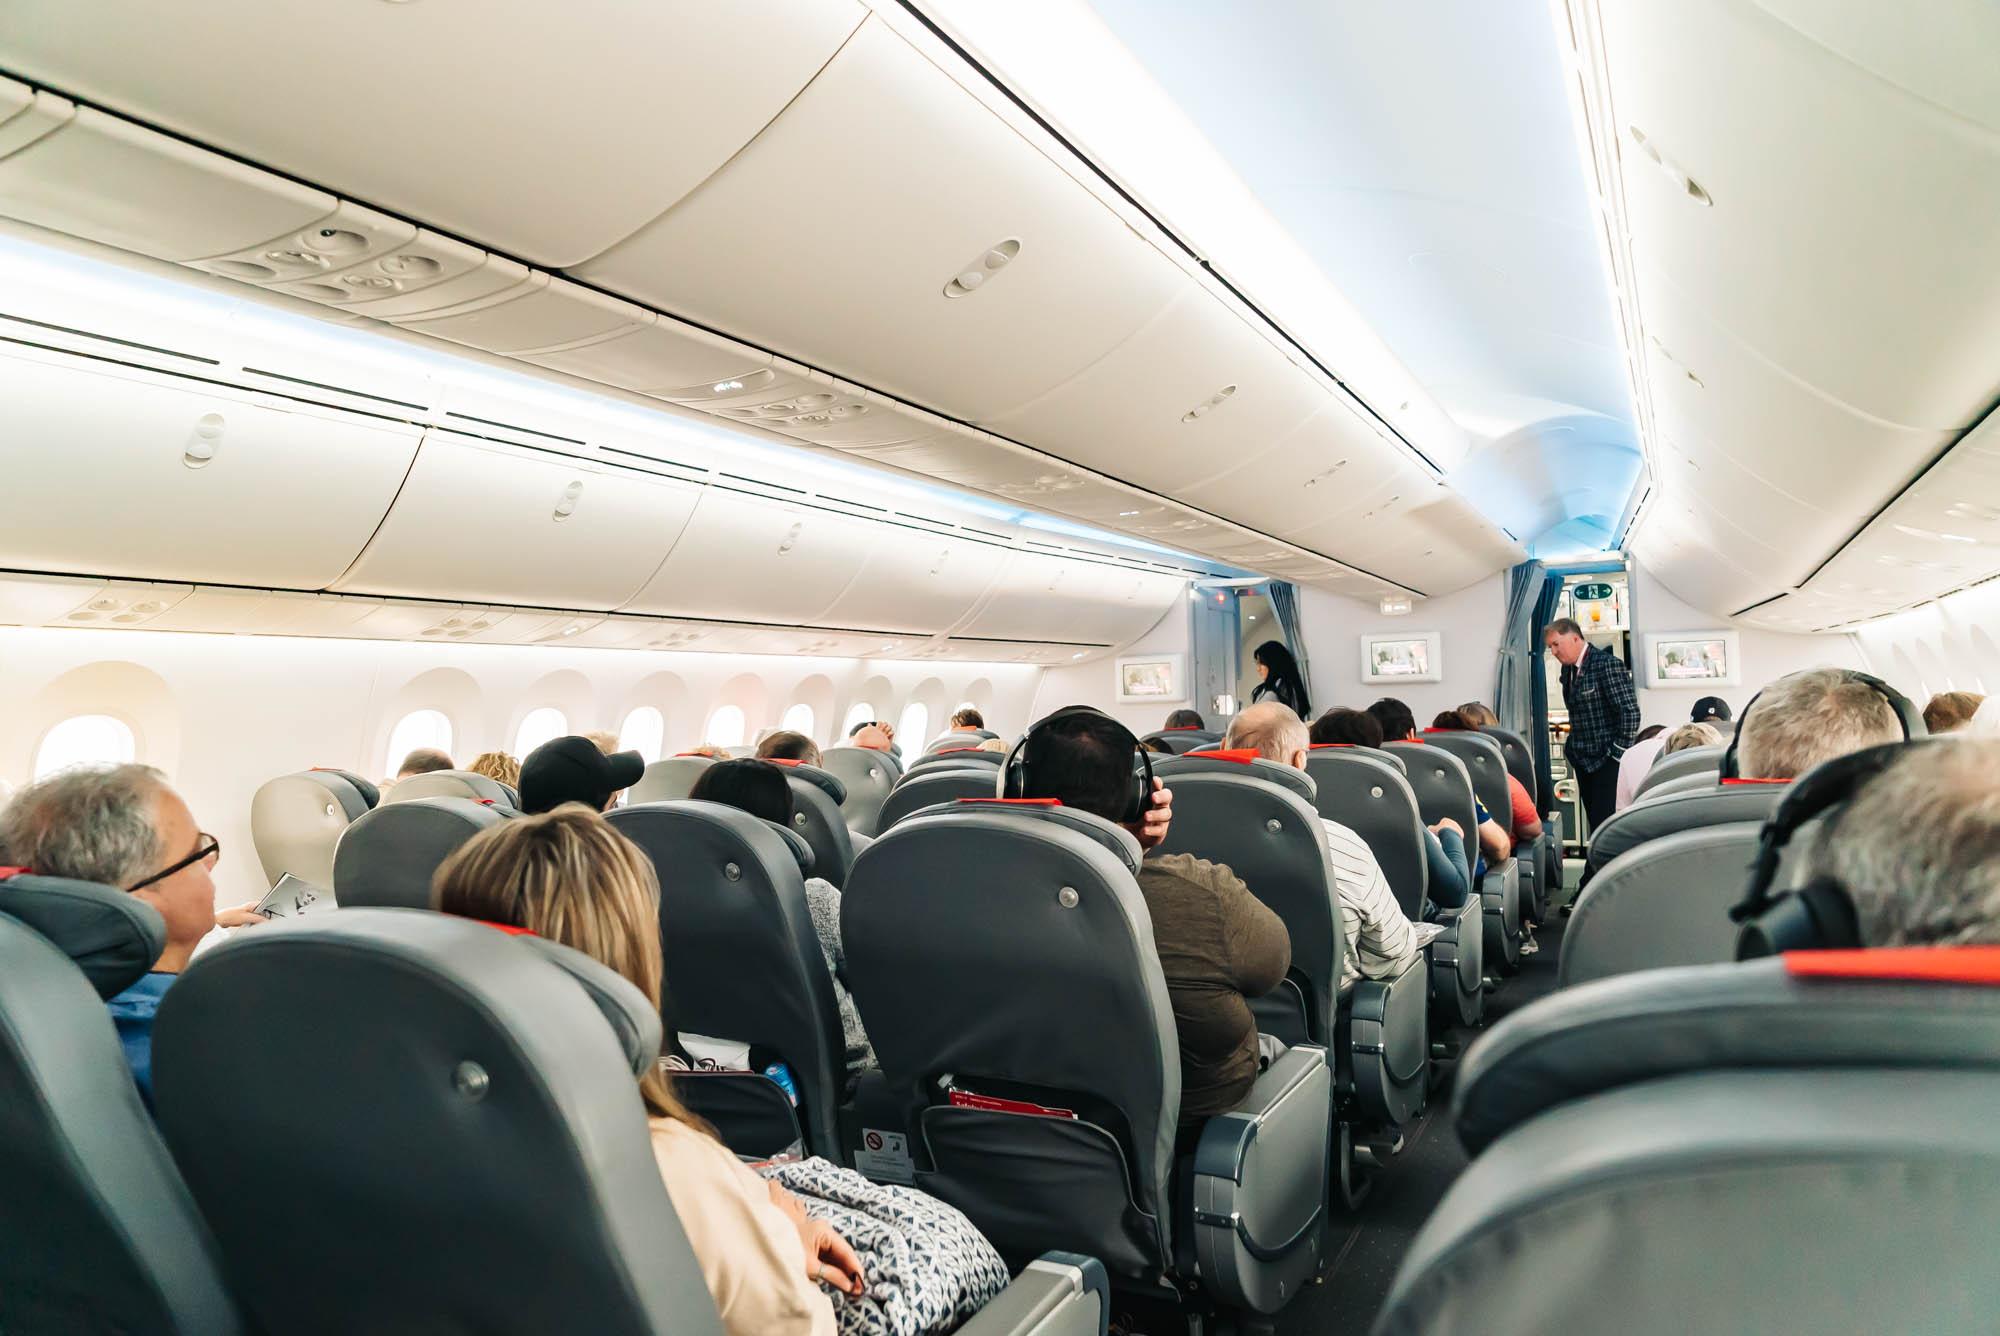 Norwegian Air's Premium Cabin